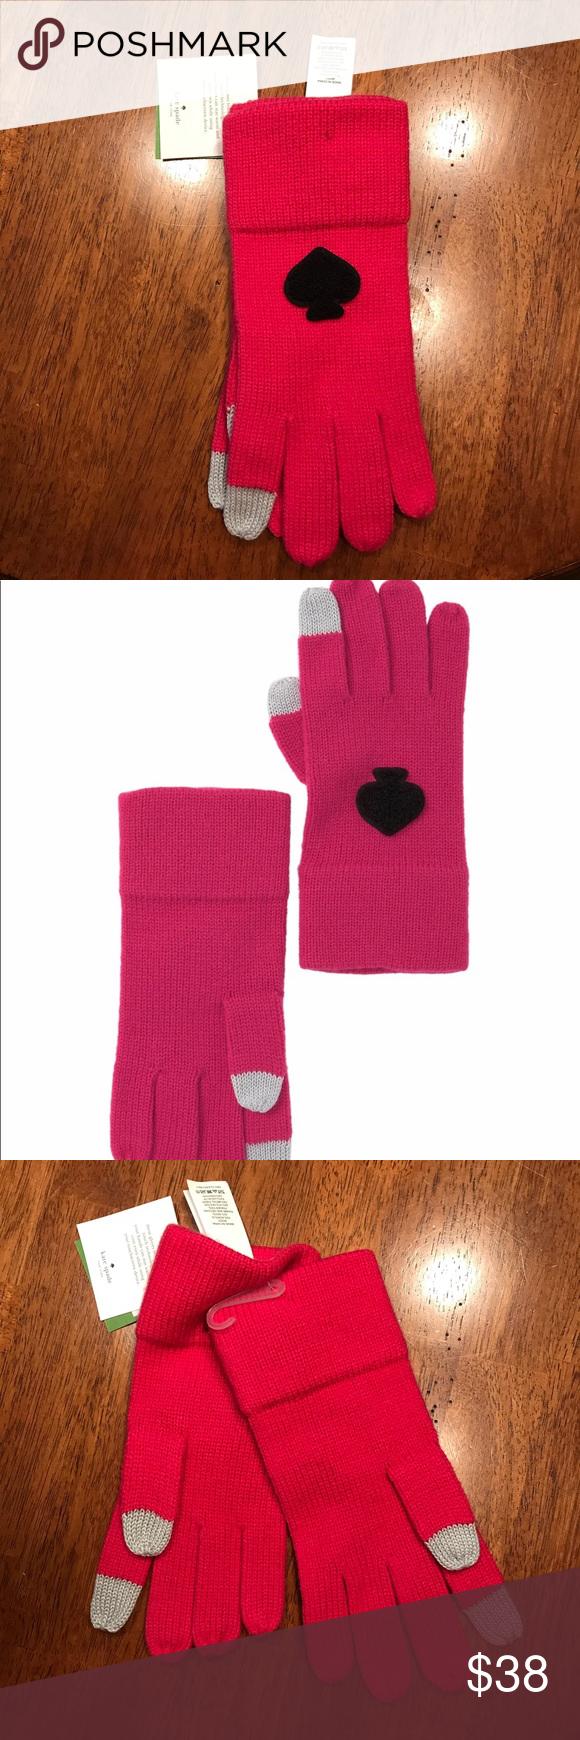 Kate Spade Tech Gloves In 2020 Tech Gloves Touch Screen Gloves Kate Spade